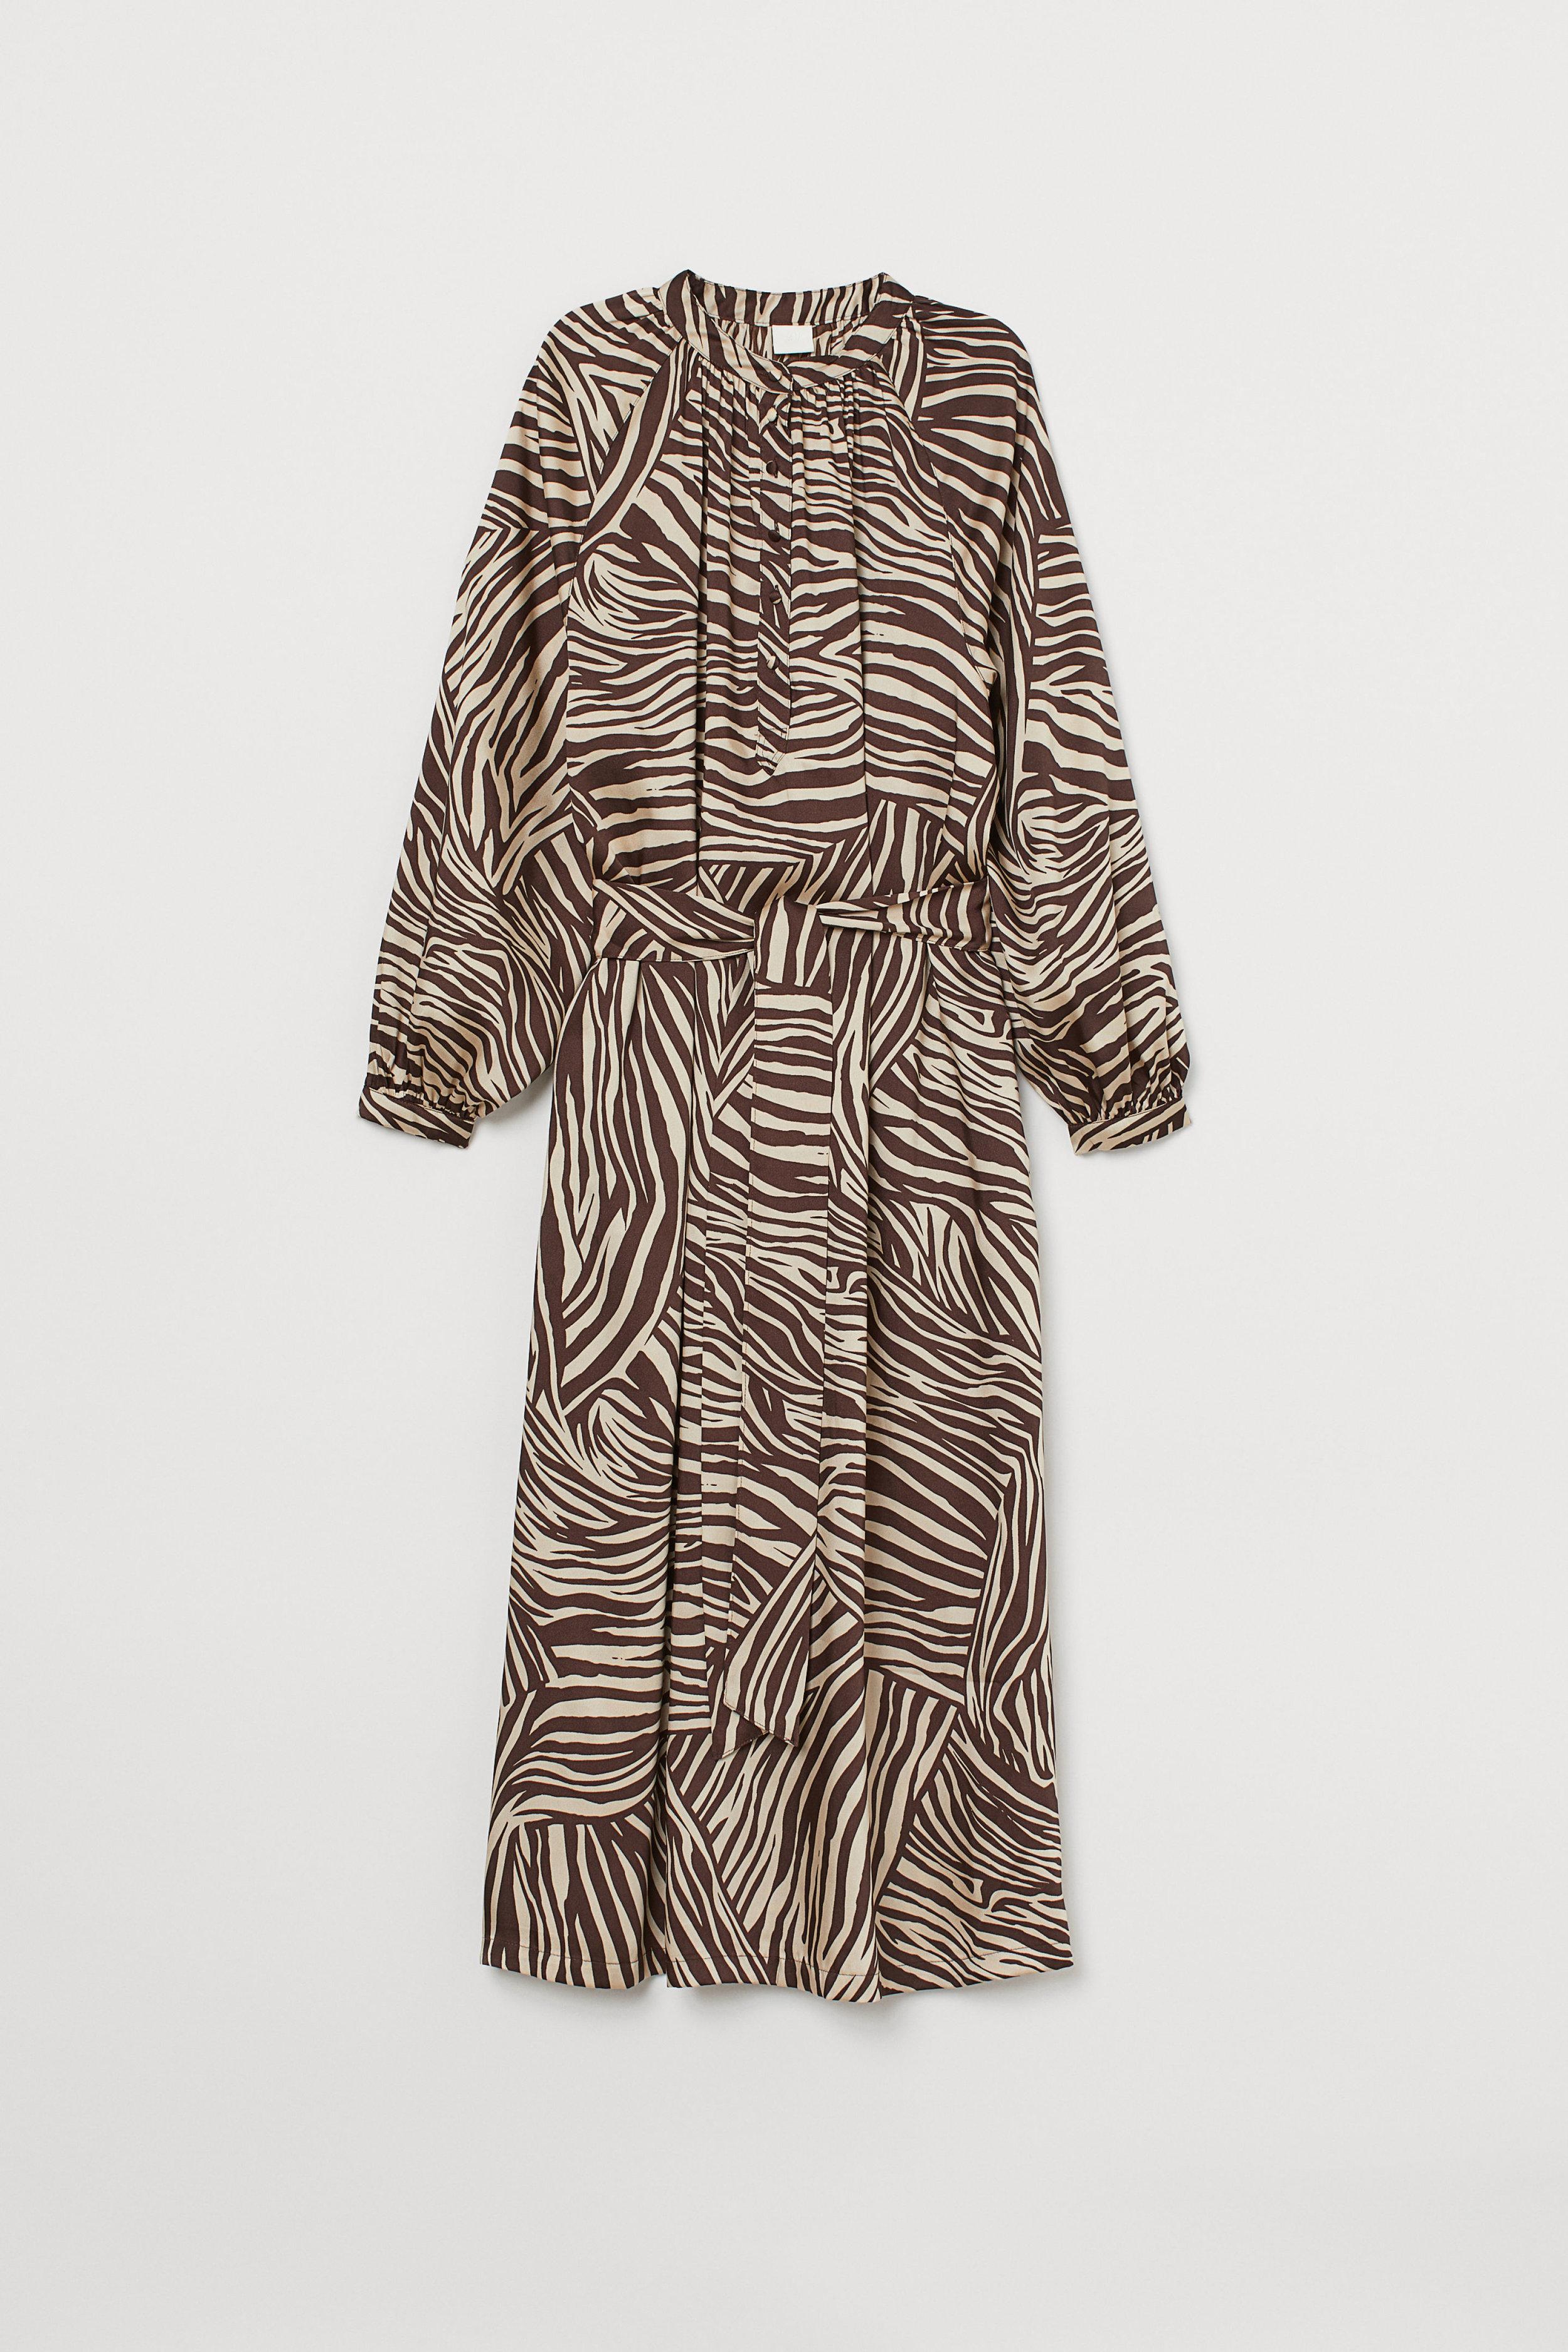 HM TIE-BELT DRESS 24.99.jpg